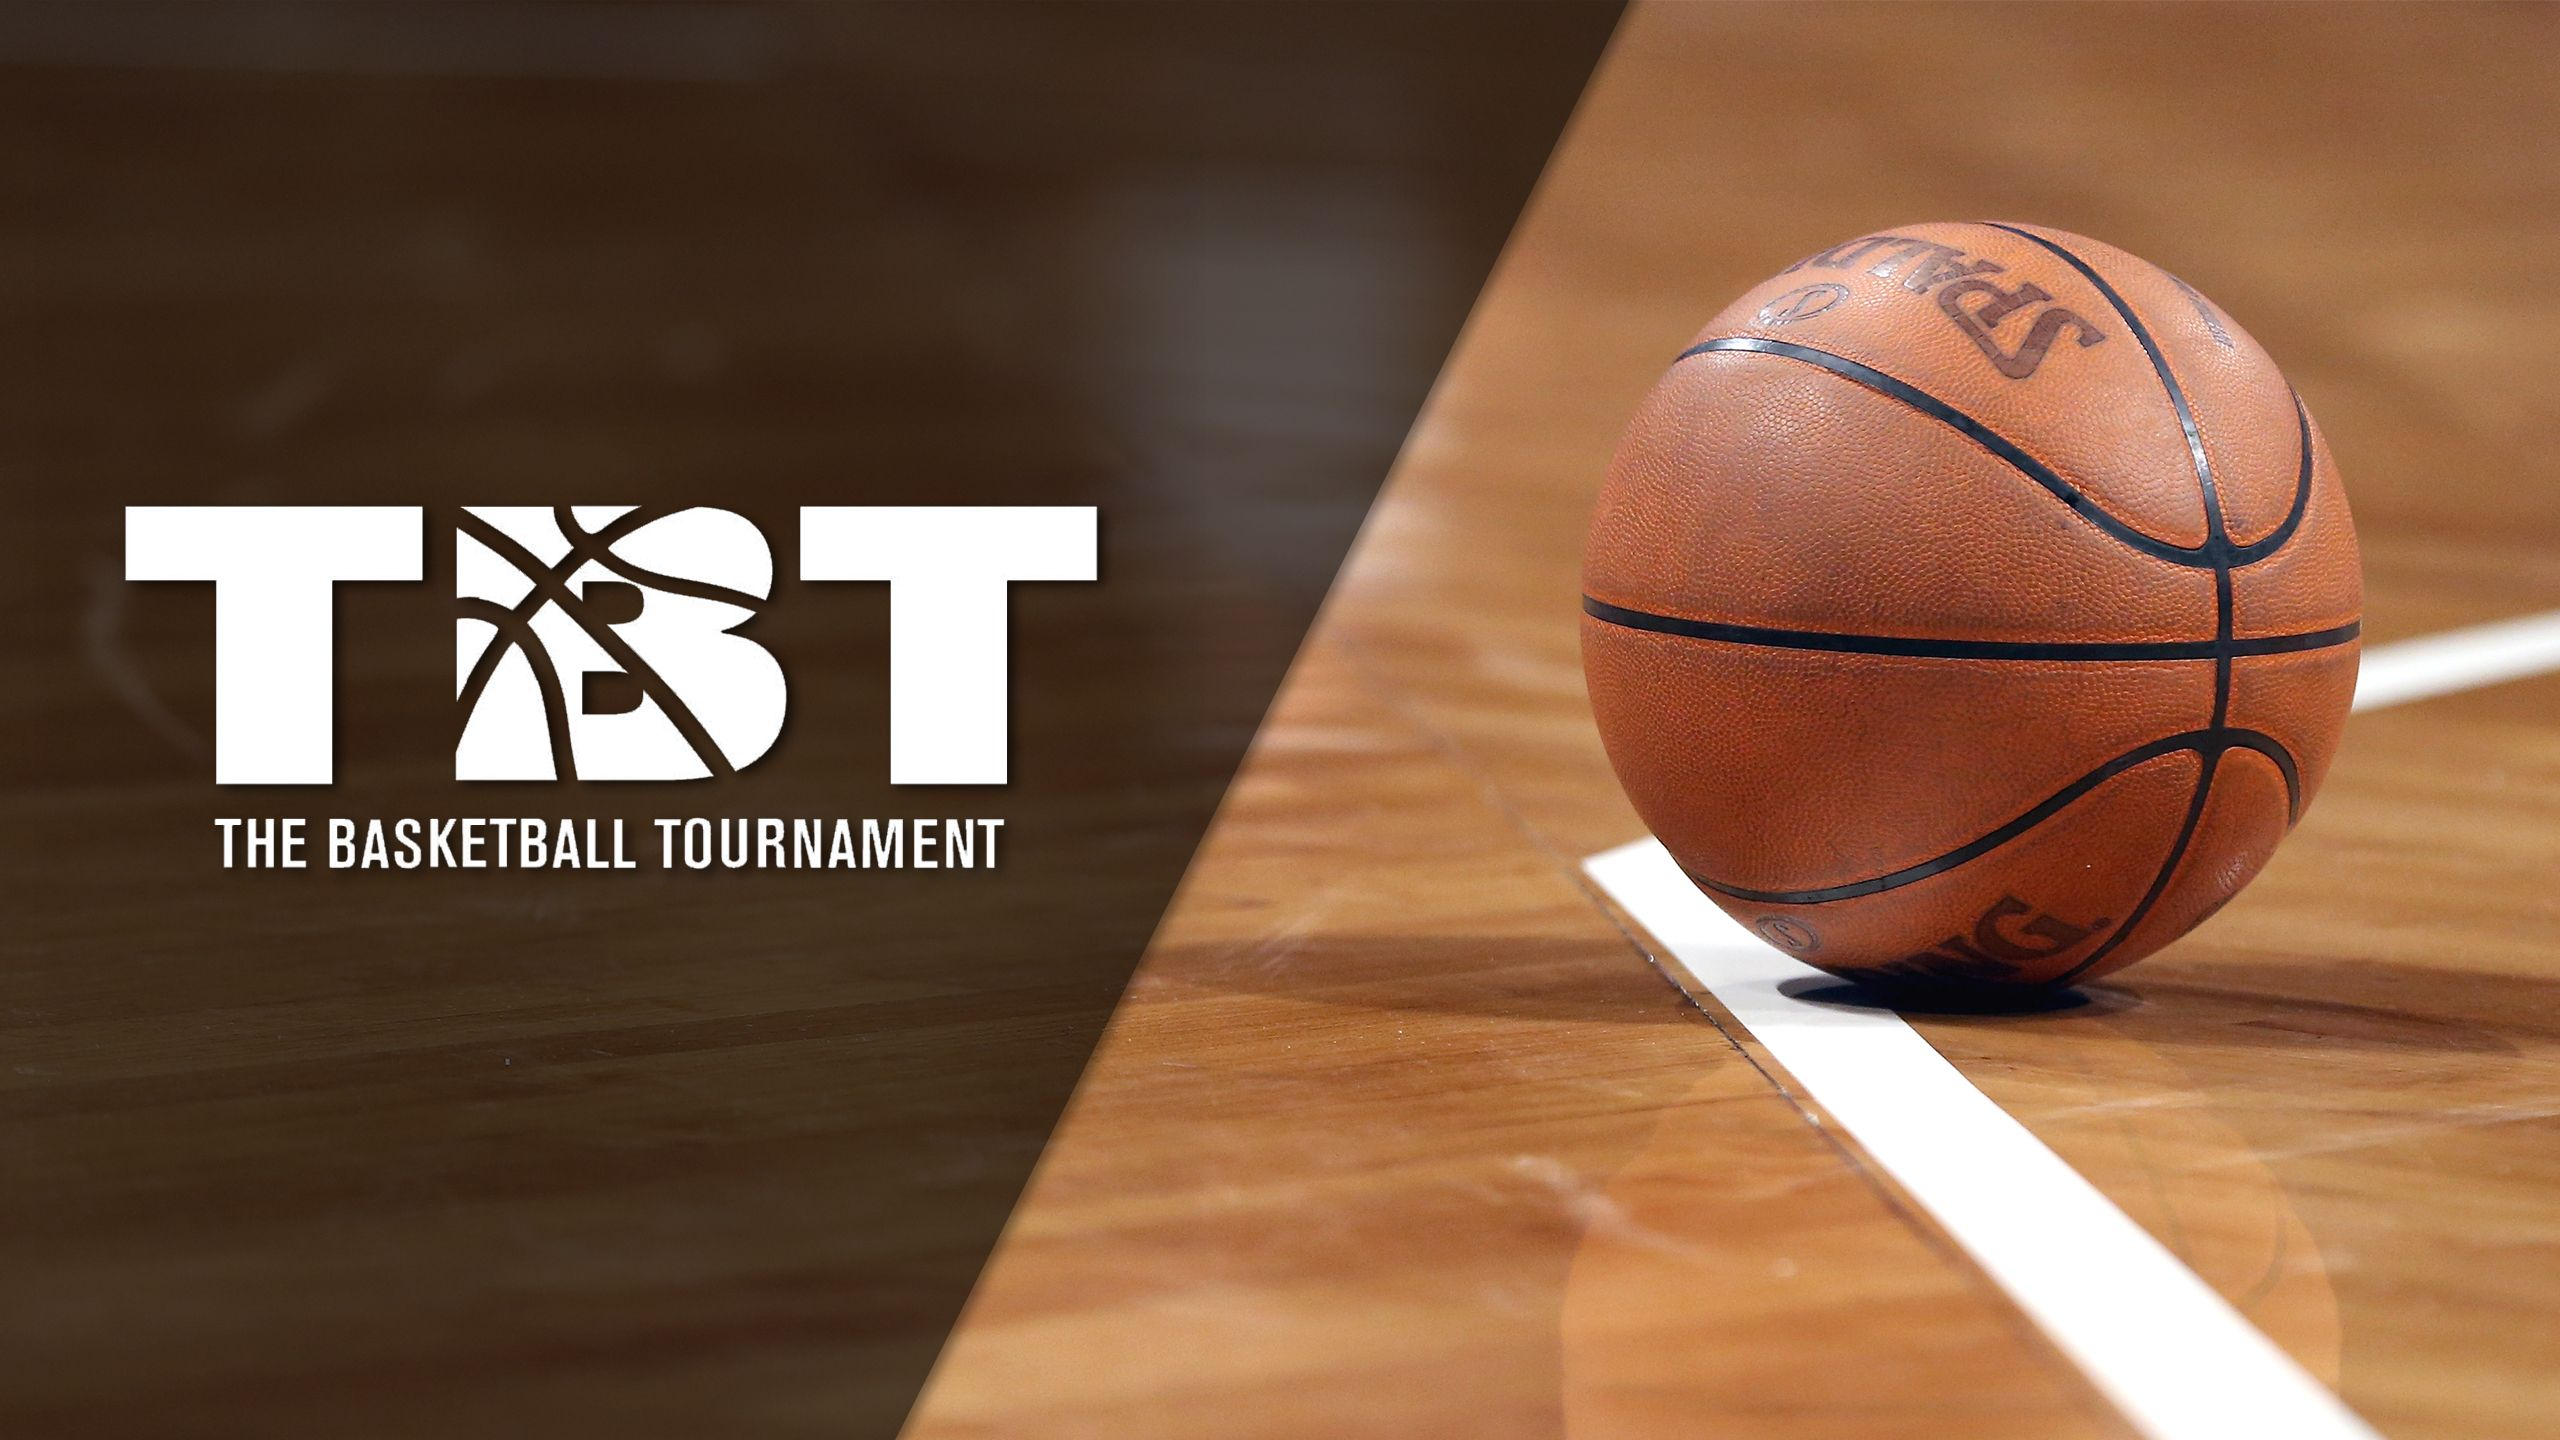 The Region vs. Fort Wayne Champs (Regional Round) (TBT)